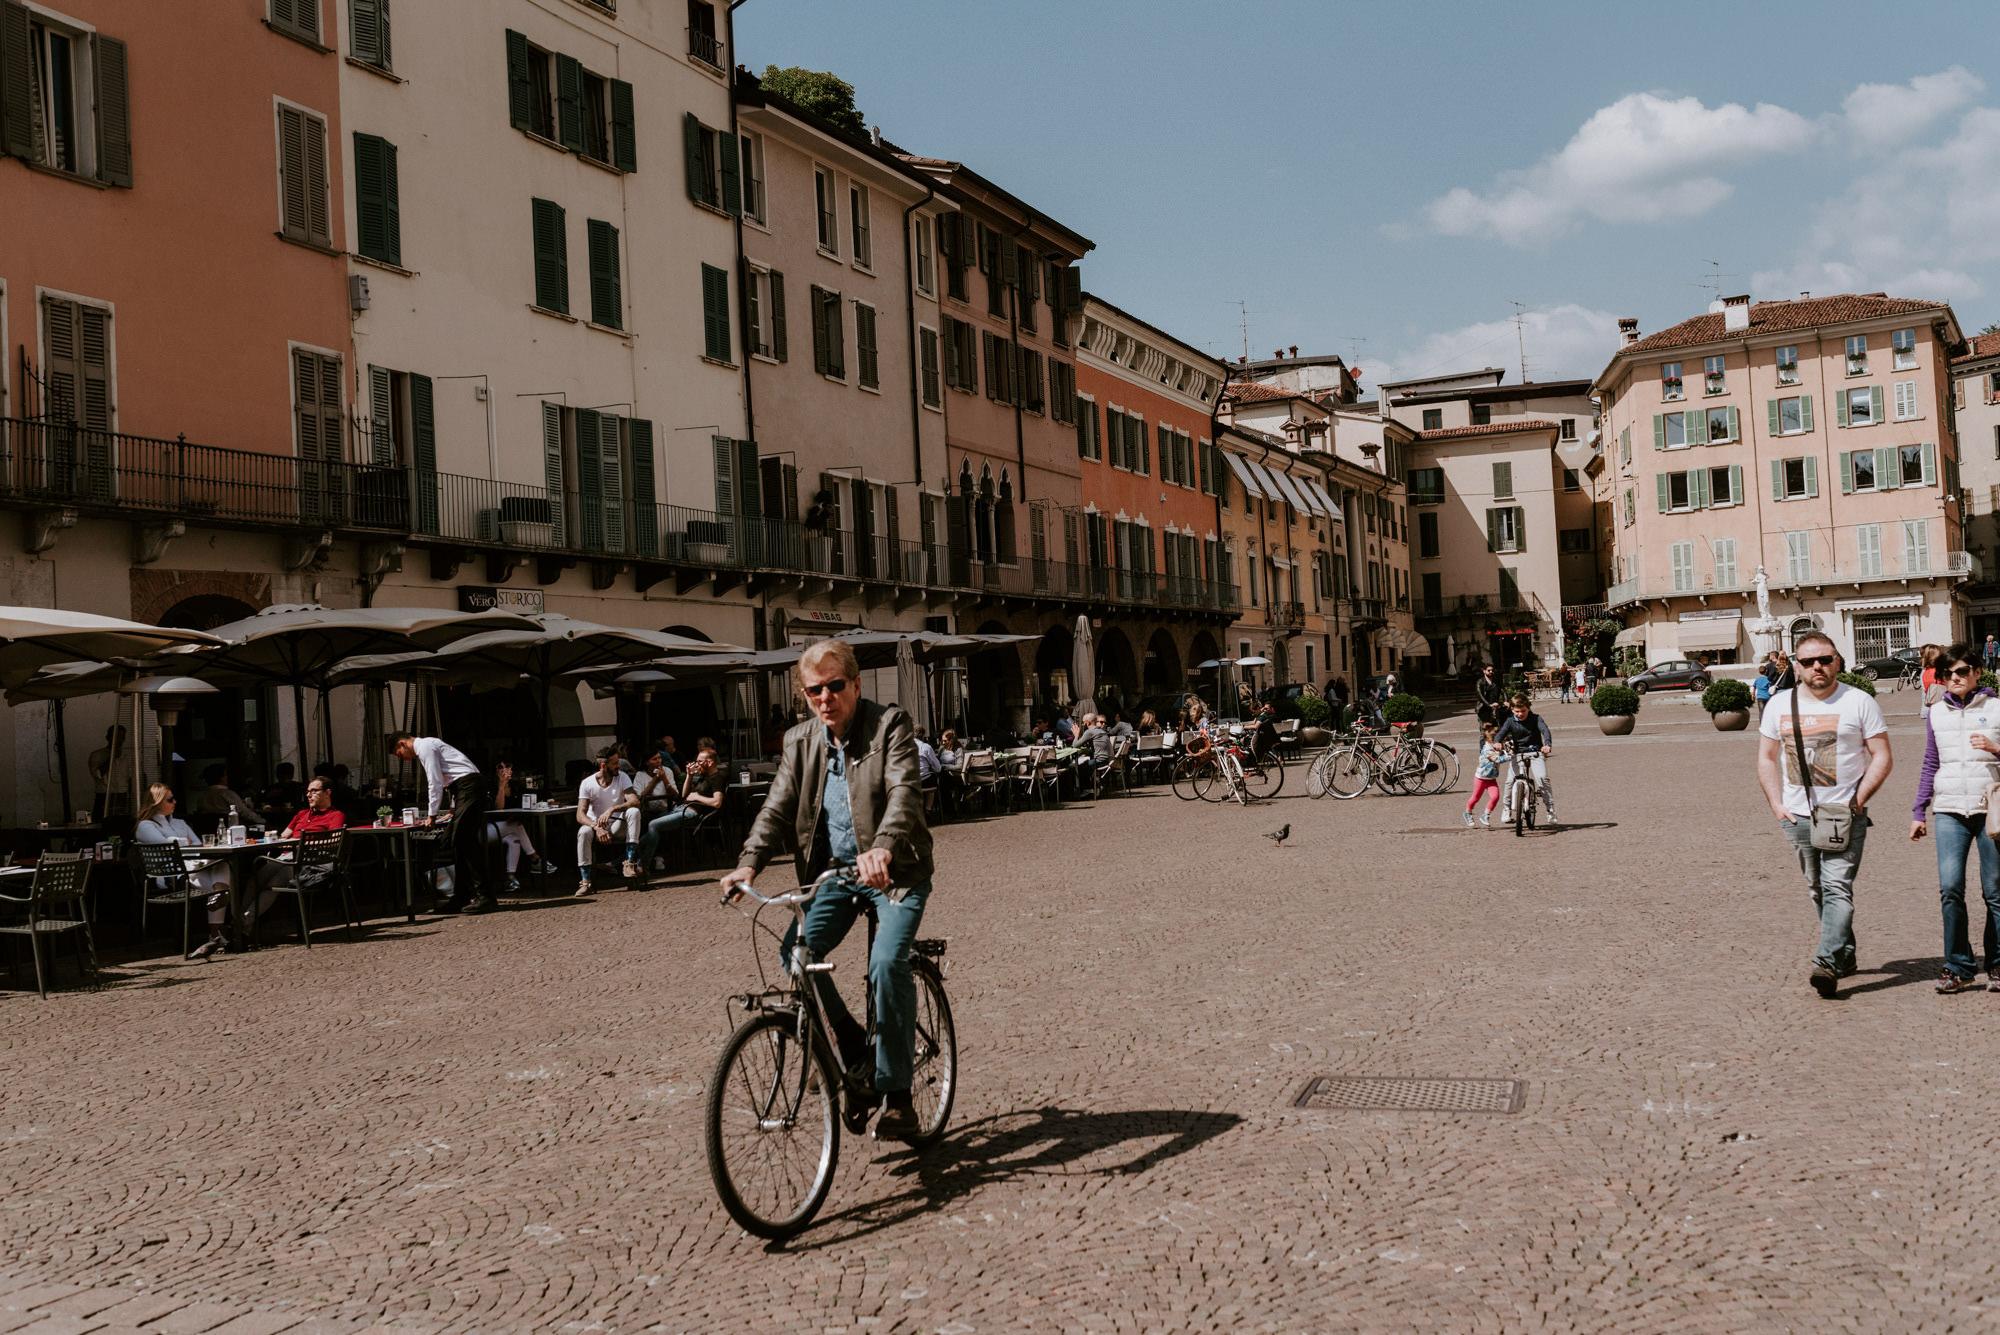 FOTO+PHOTO+BODA+WEDDING+ITALIA+ITALY+MAURICIO+GARAY+MAURICIOGARAY+WEDDINPHOTOGRAPHER+FOTOGRAFODEBODA-5.jpg